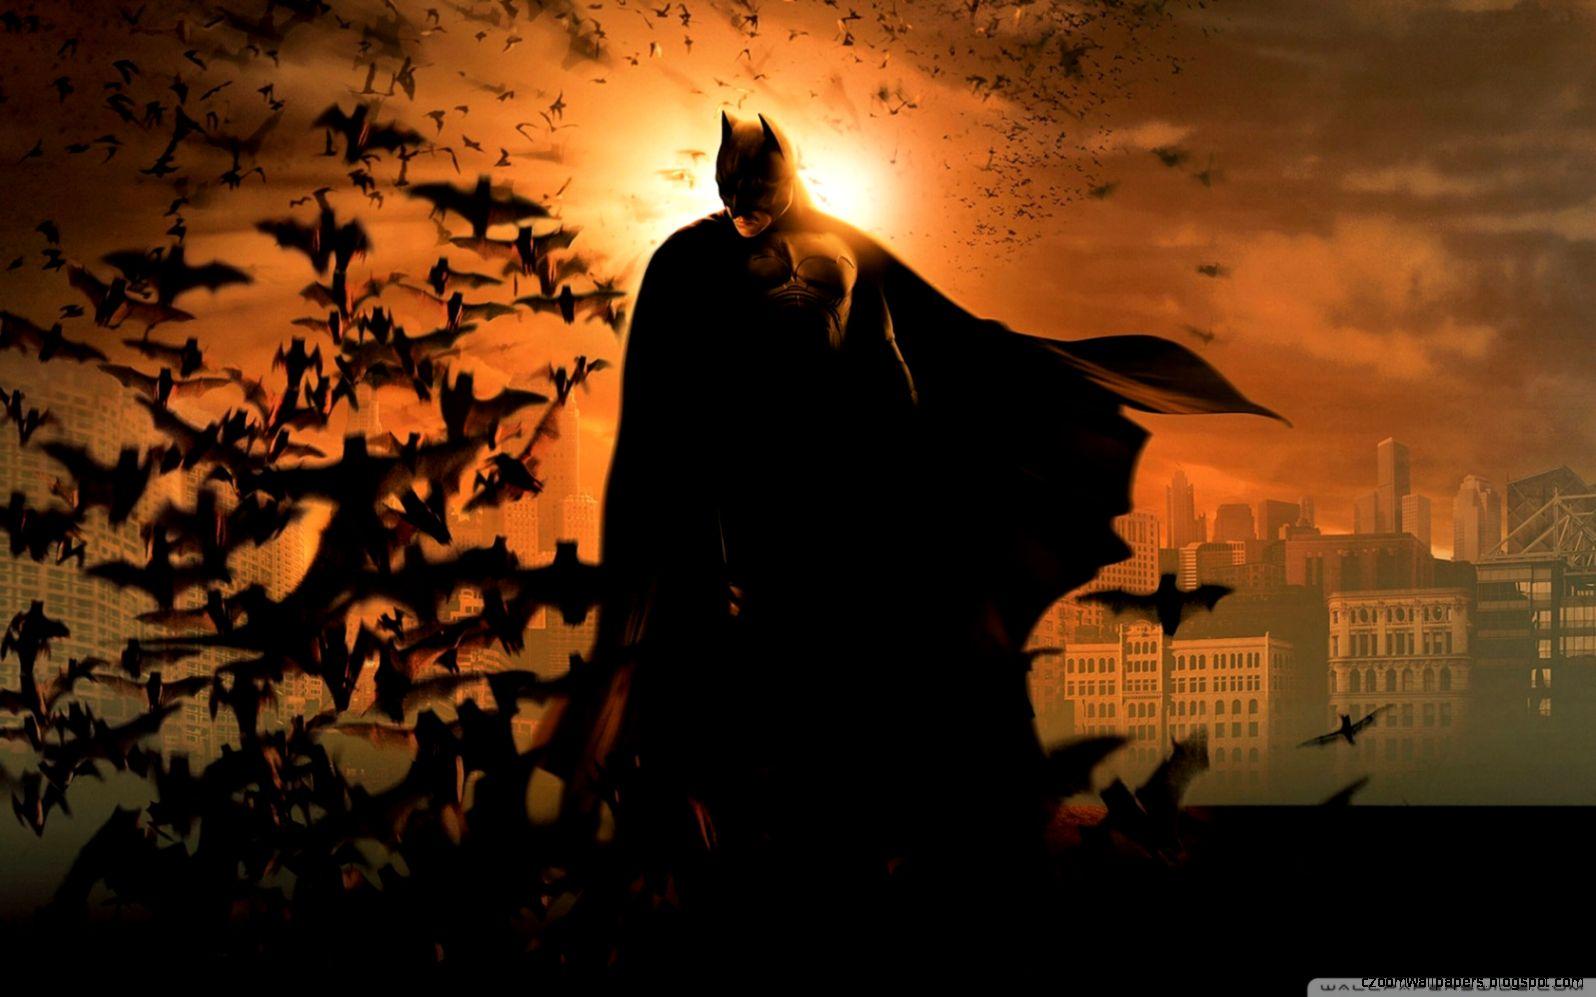 Batman 3 The Dark Knight Rises HD desktop wallpaper  Widescreen